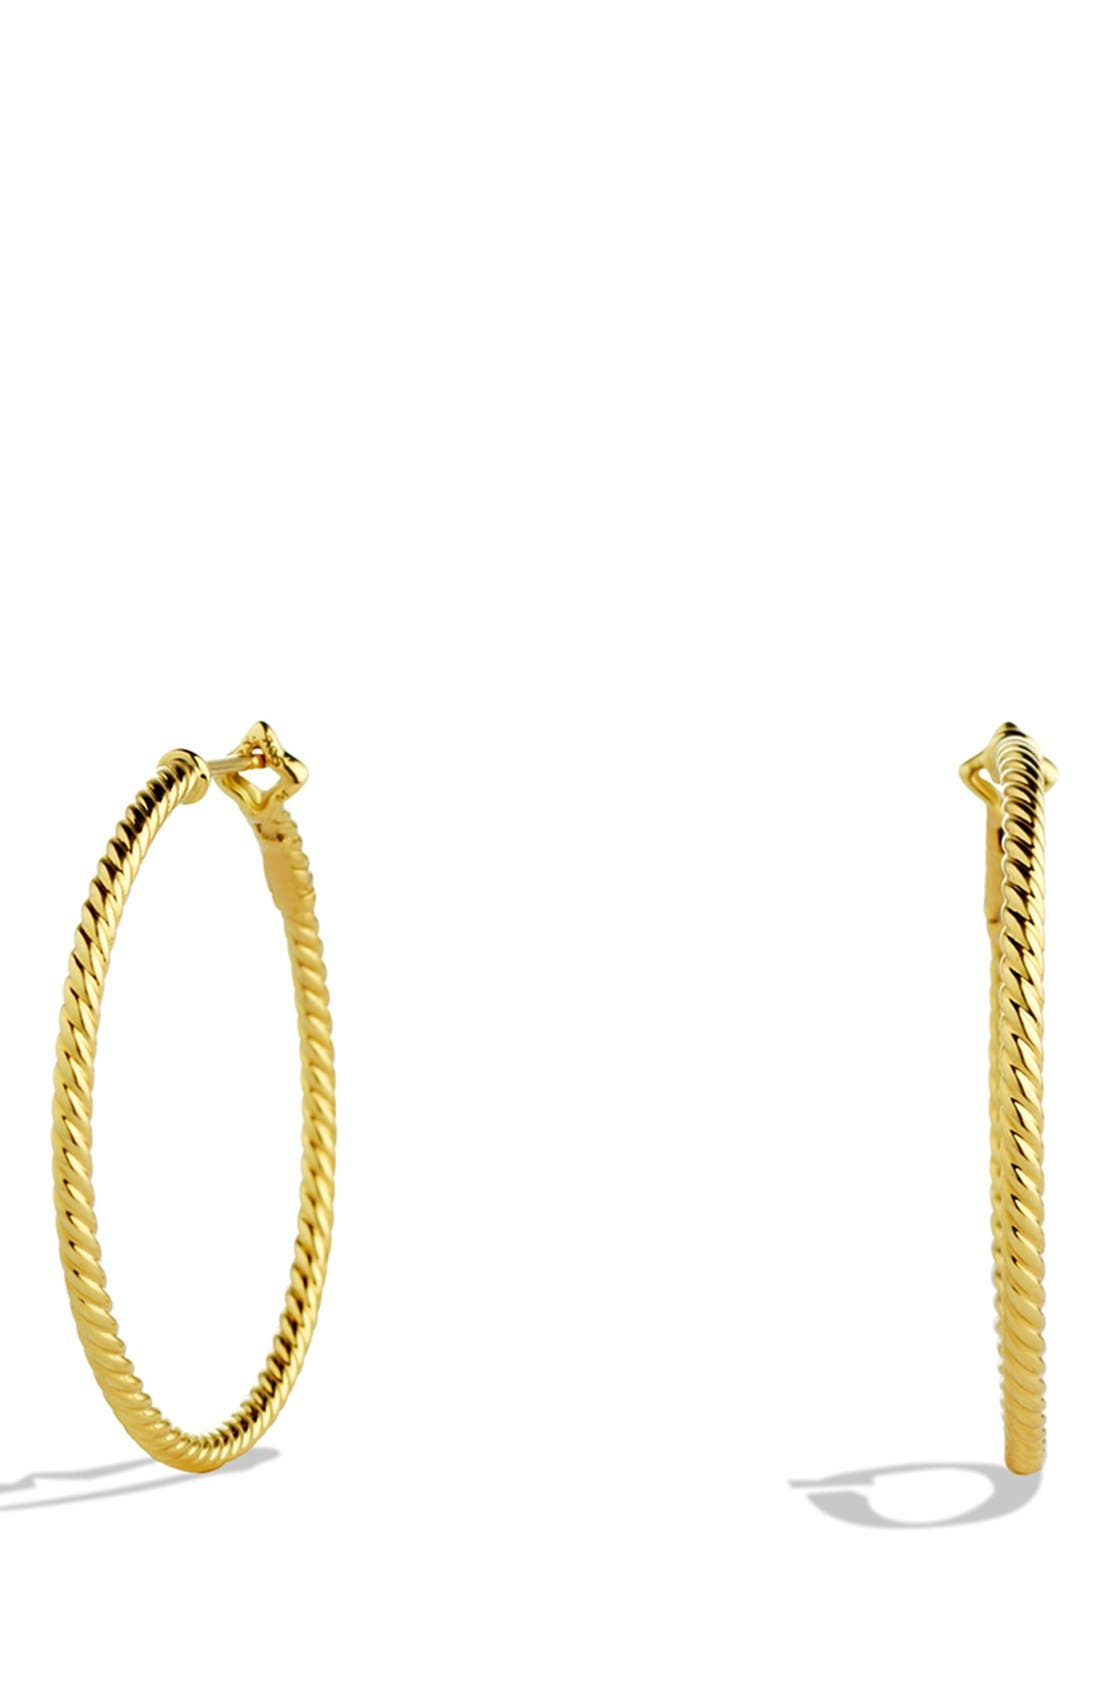 Cable Classics Hoop Earrings,                             Main thumbnail 1, color,                             GOLD